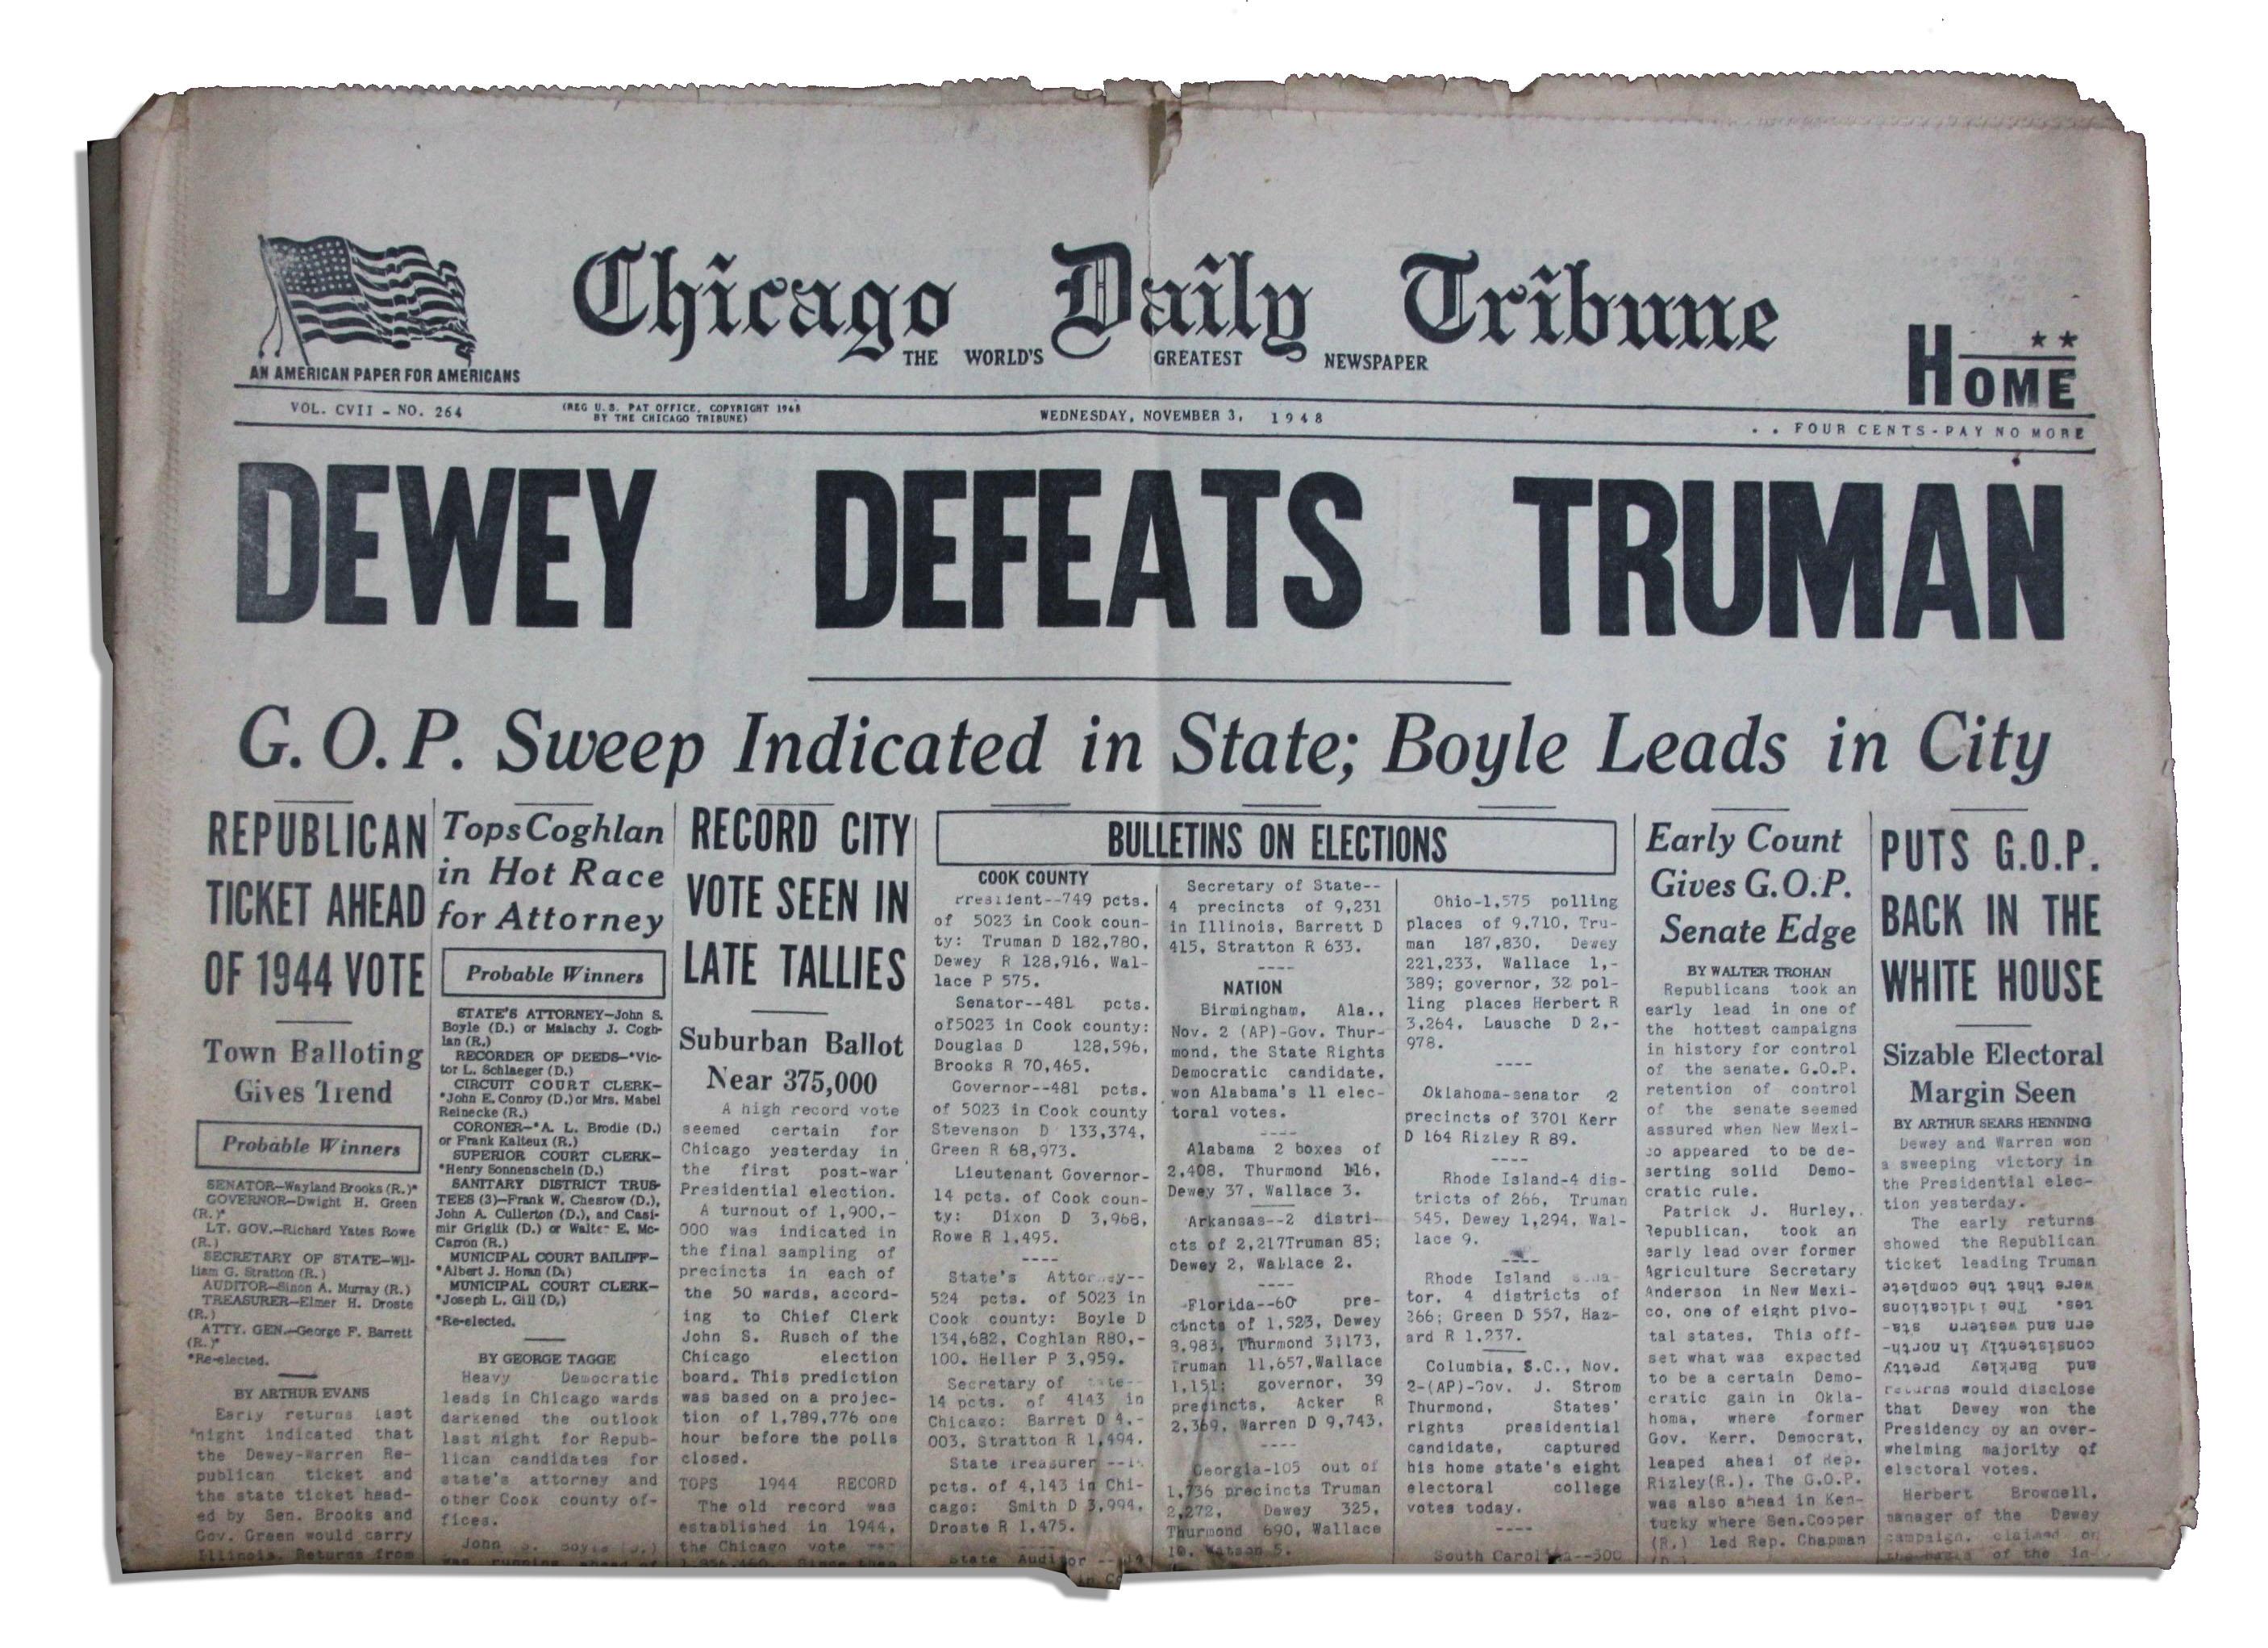 Headline Dewey Defeats Truman